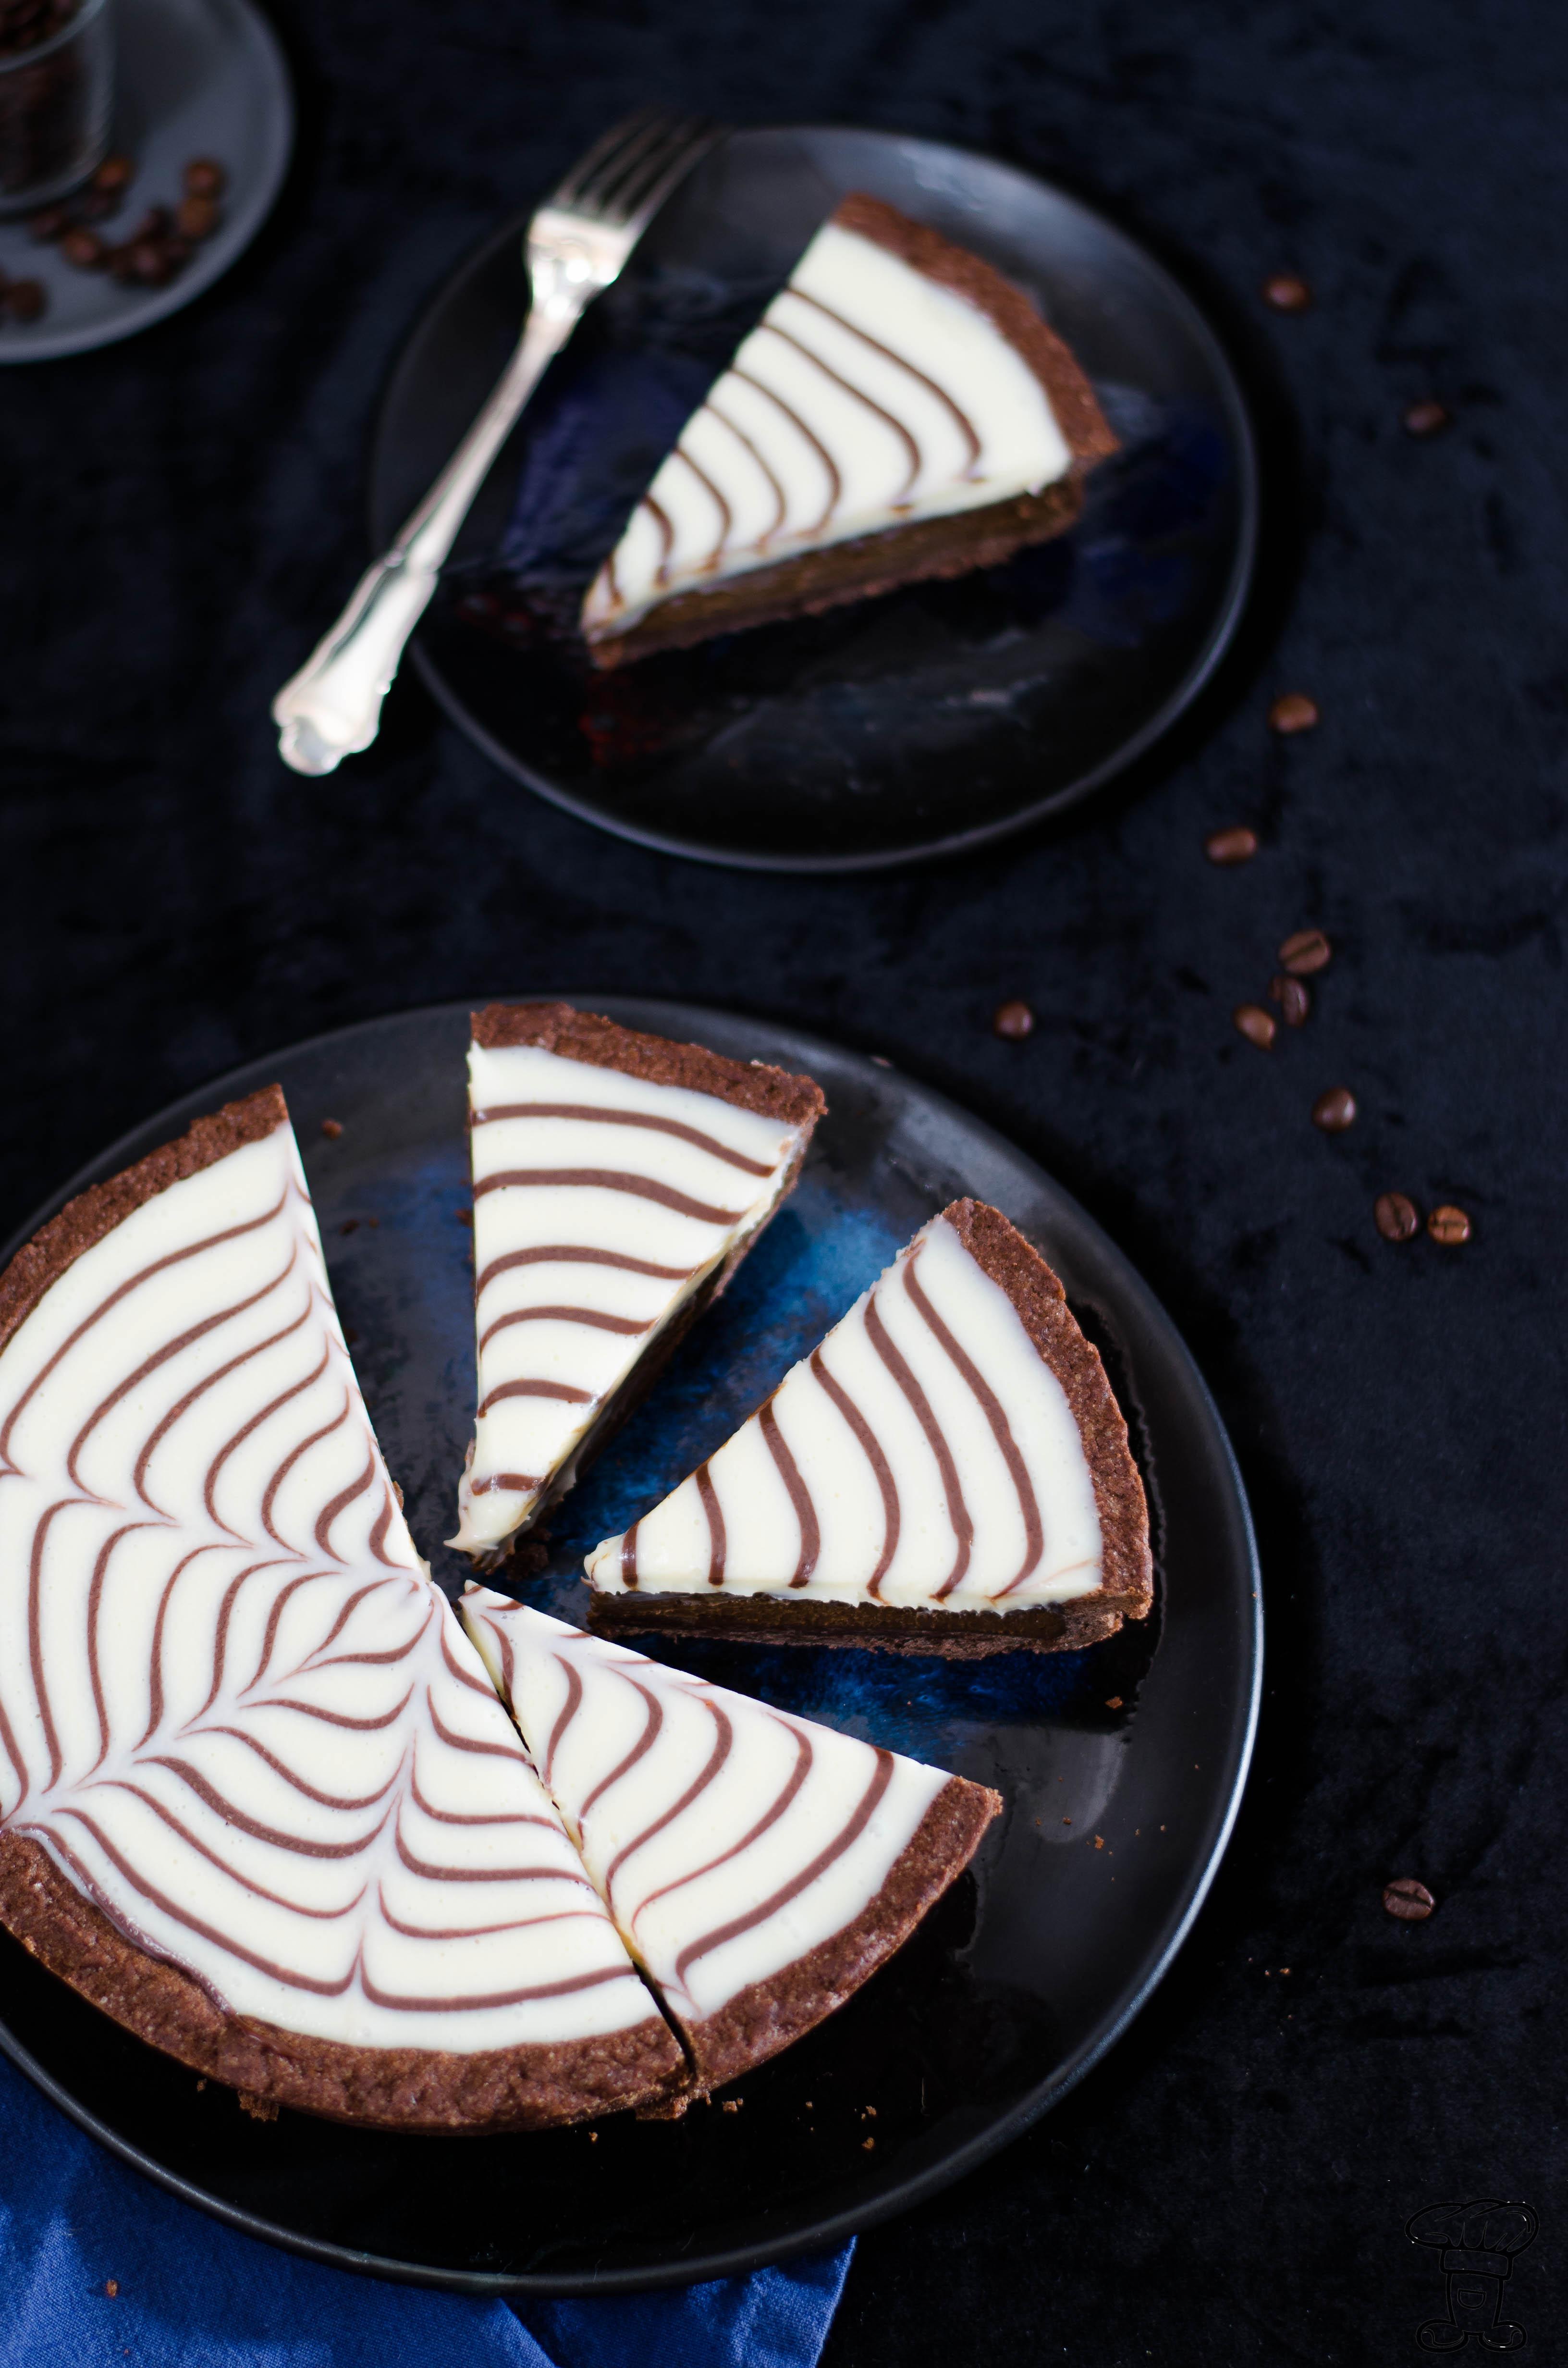 torta_mocaccino_knam5 Torta mocaccino di Knam